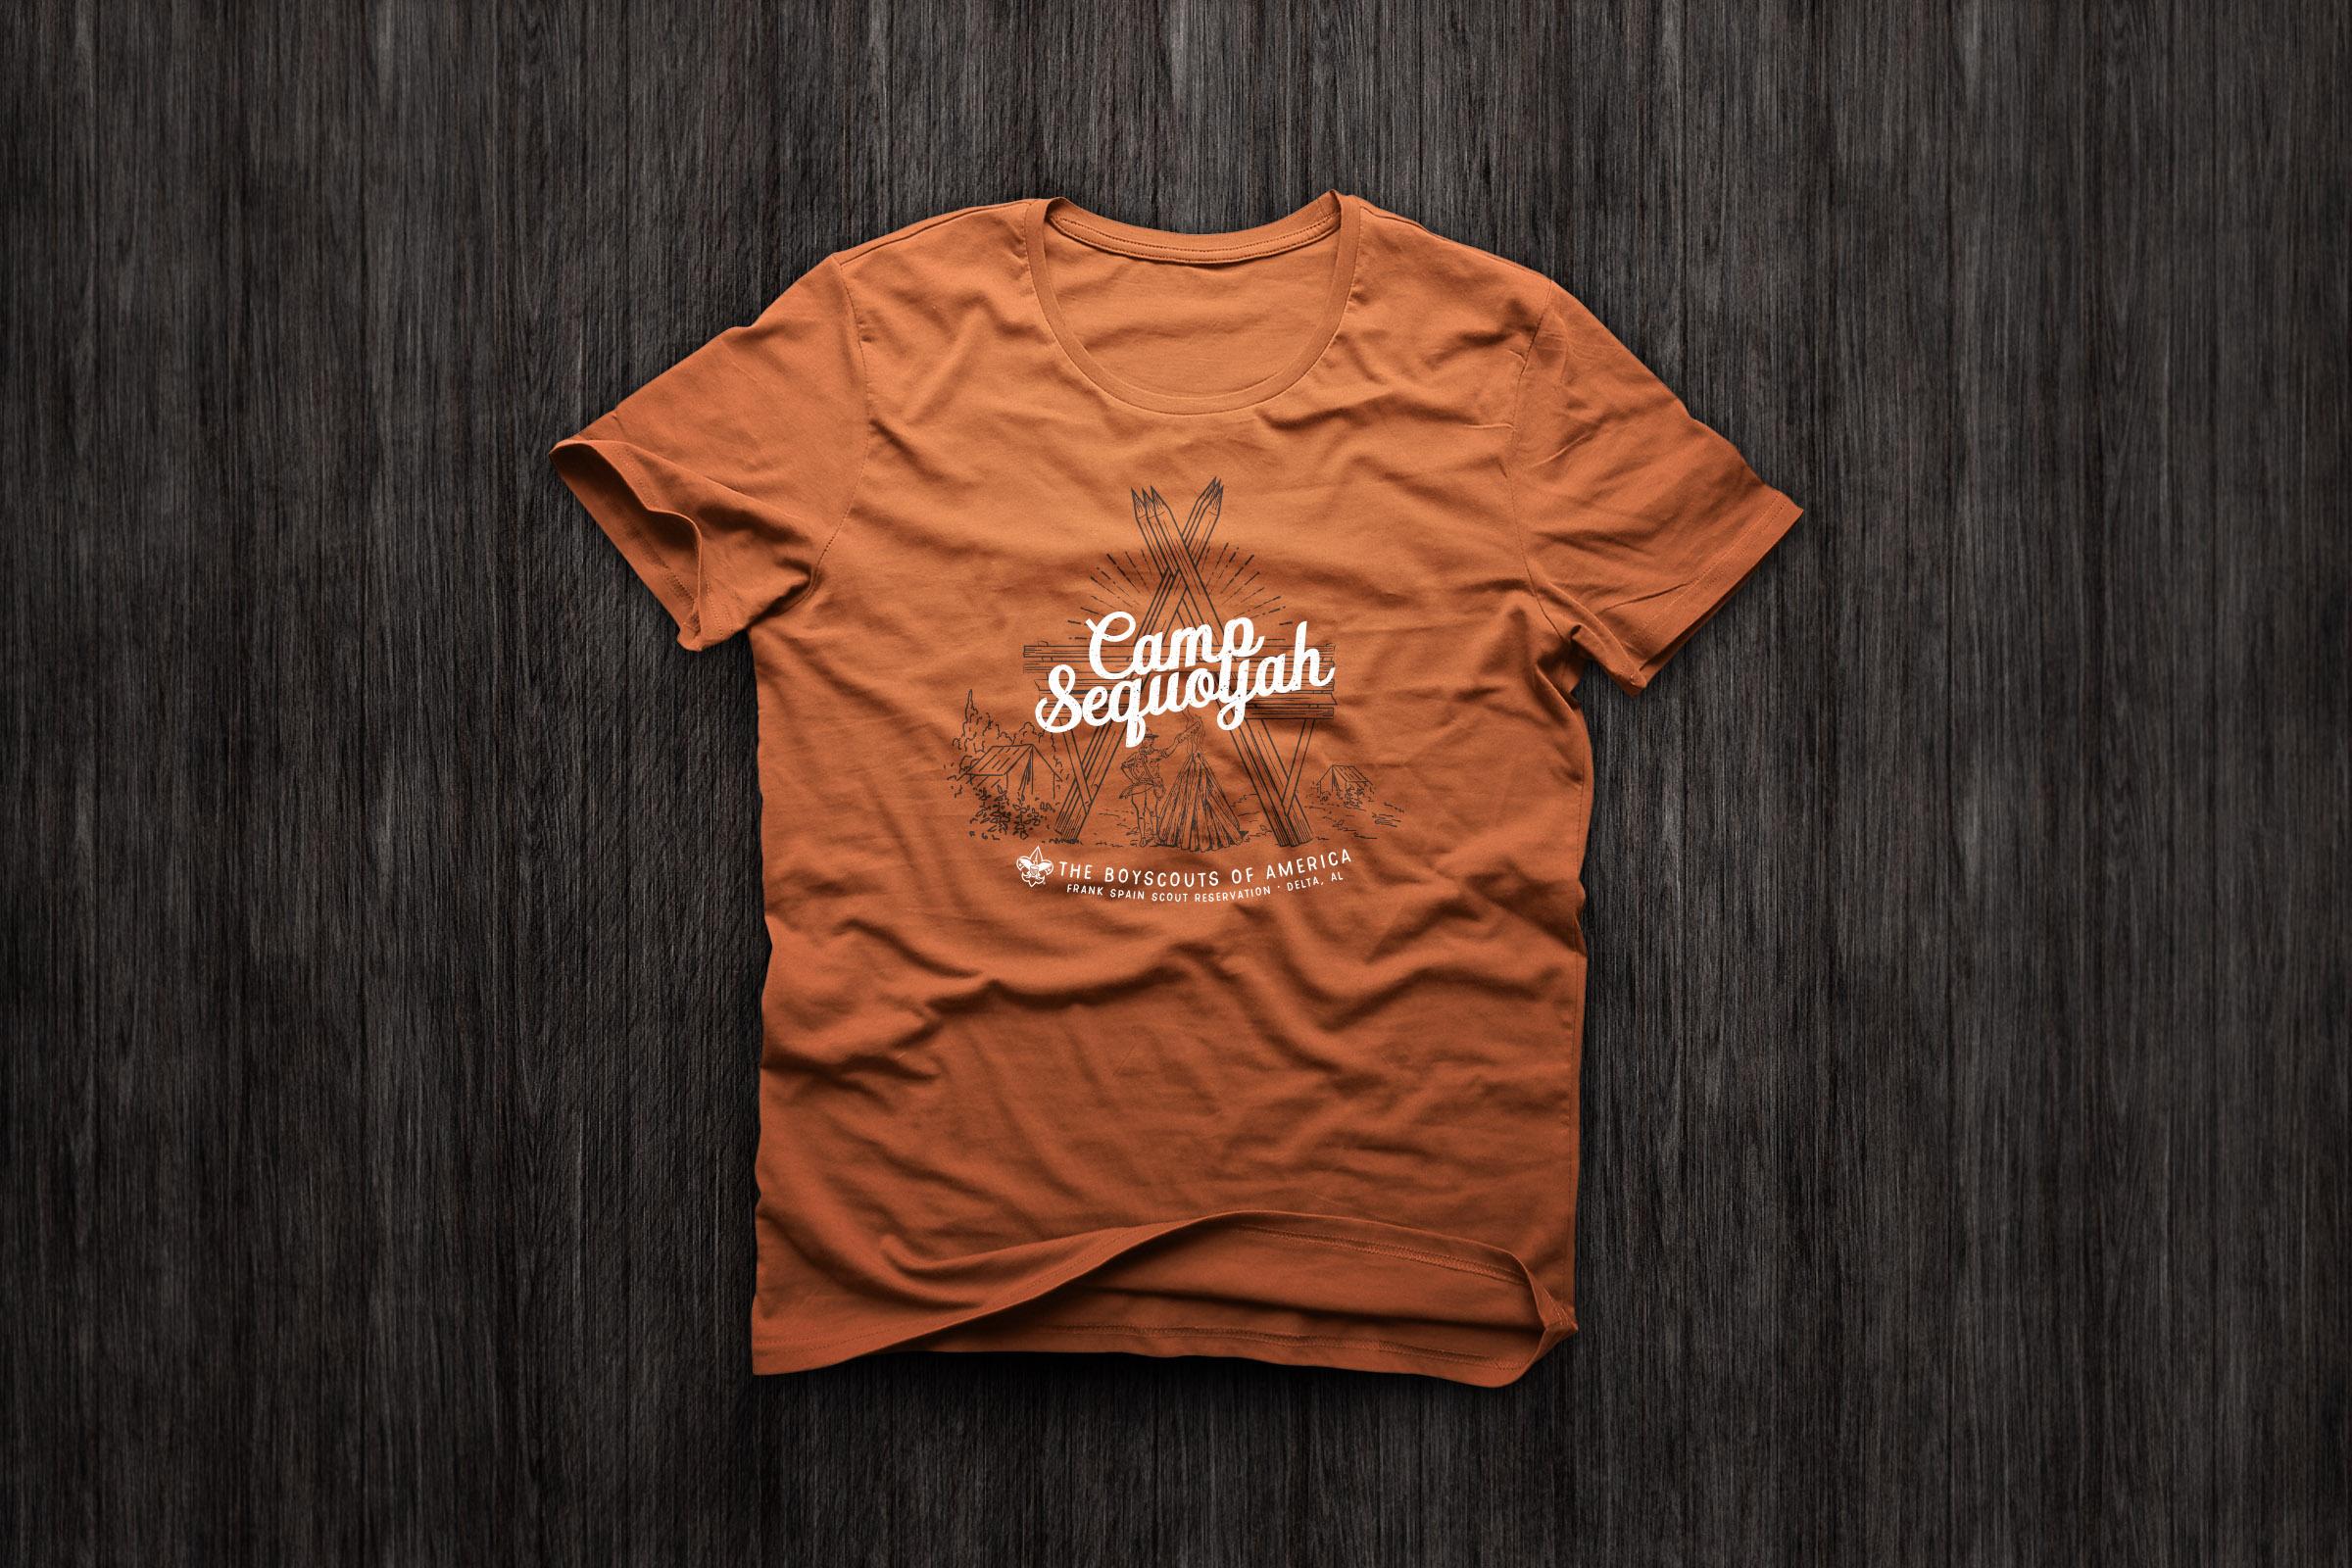 CampSequoyah_Shirt2.jpg